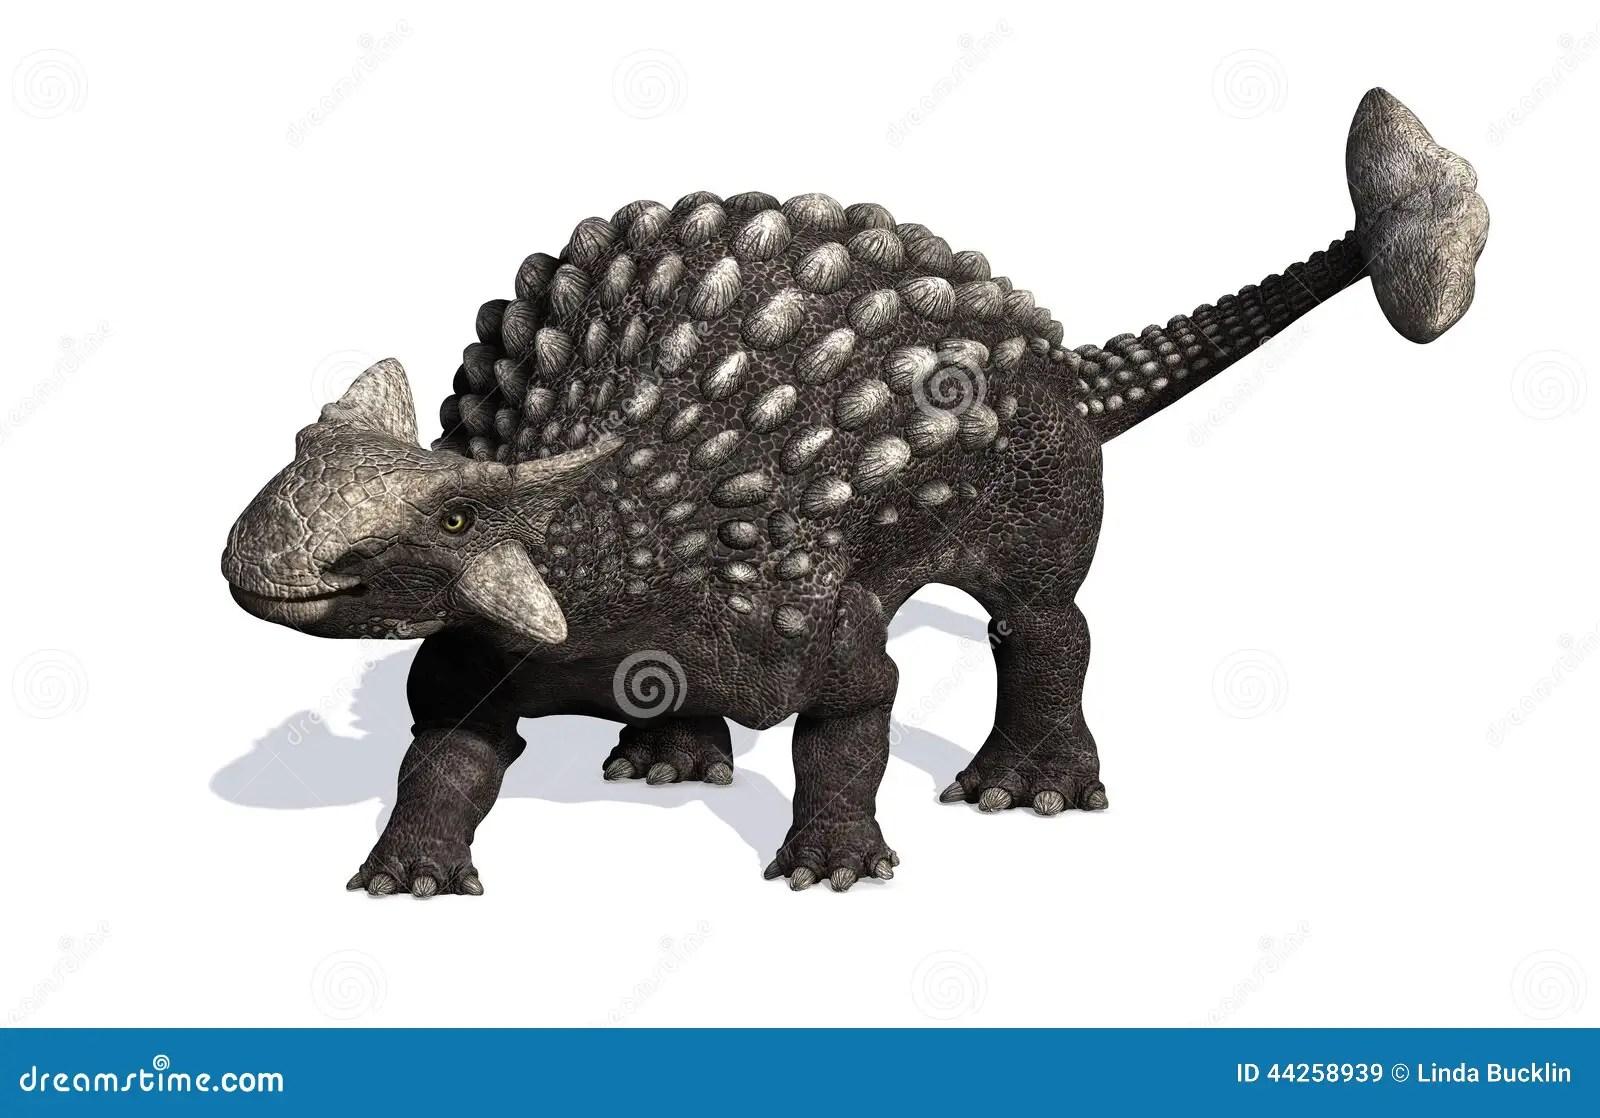 the ankylosaurus dinosaur lived during the cretaceous period 3d